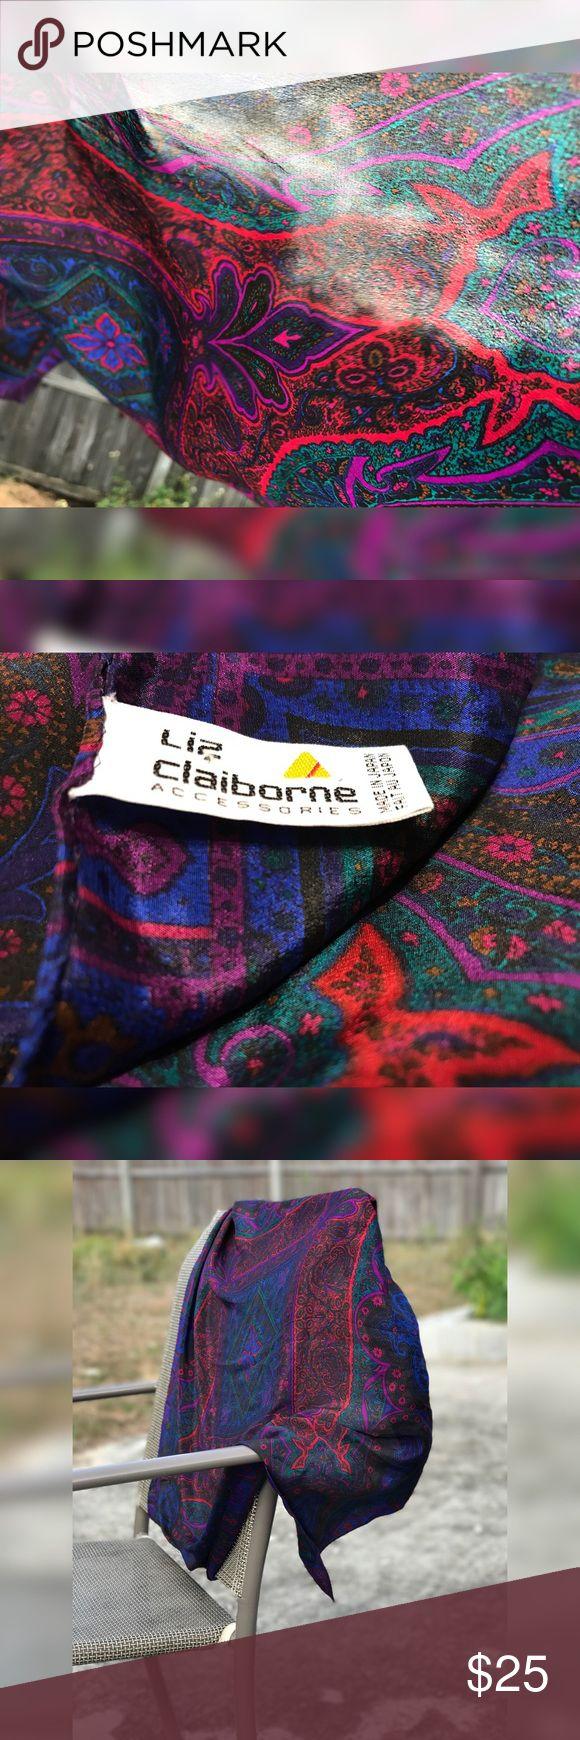 Liz Claiborne Scarf Liz Claiborne, Scarf, 41x41, Red, Blue, Green, Purple Liz Claiborne Accessories Scarves & Wraps